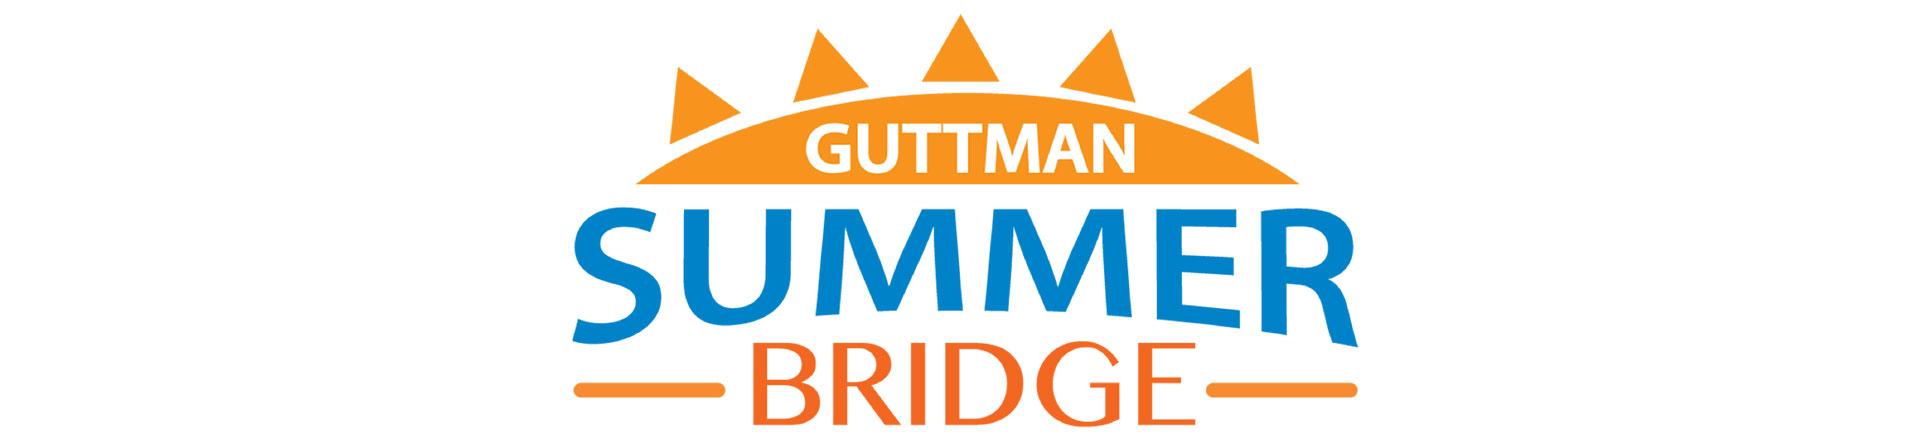 Guttman Summer Bridge logo